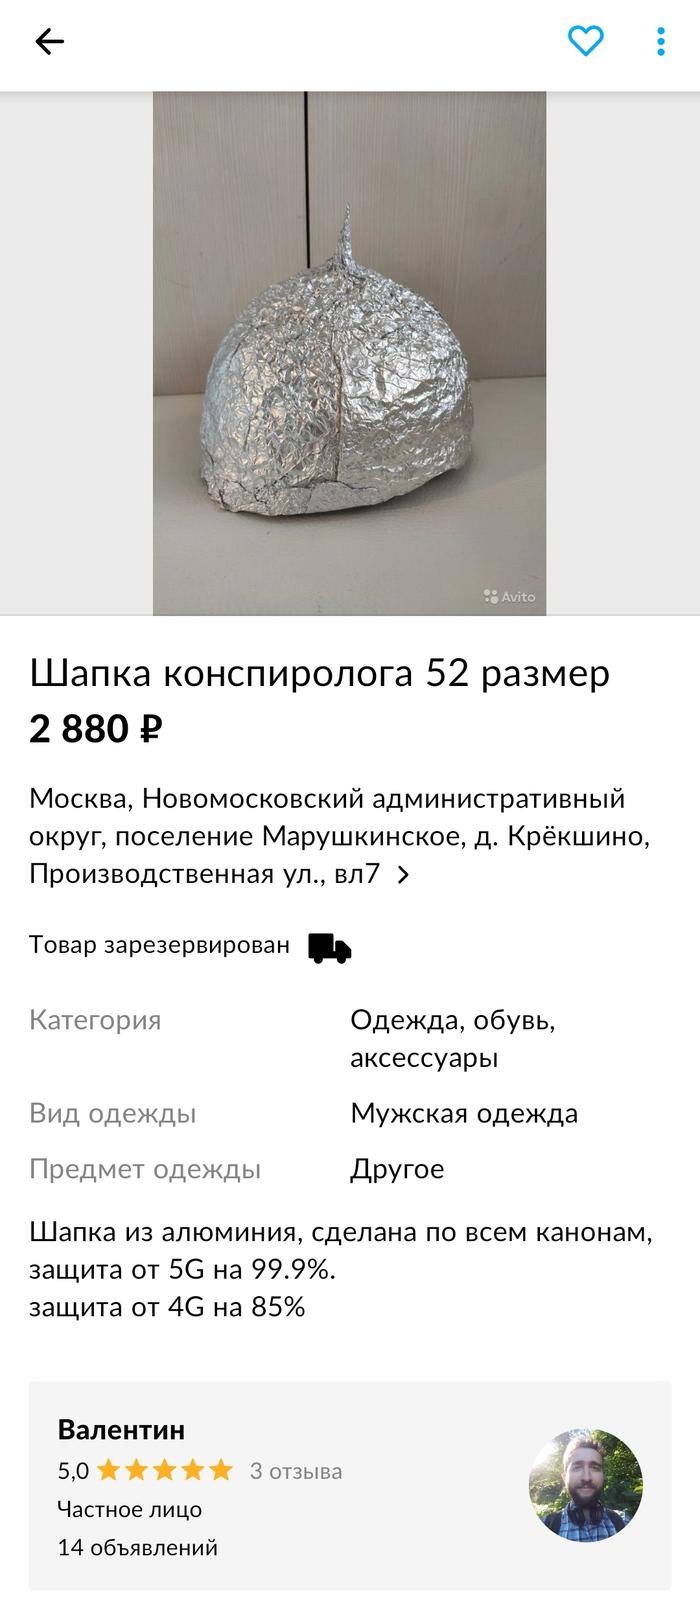 https://cs12.pikabu.ru/post_img/2020/05/06/11/1588793508164994707.jpg